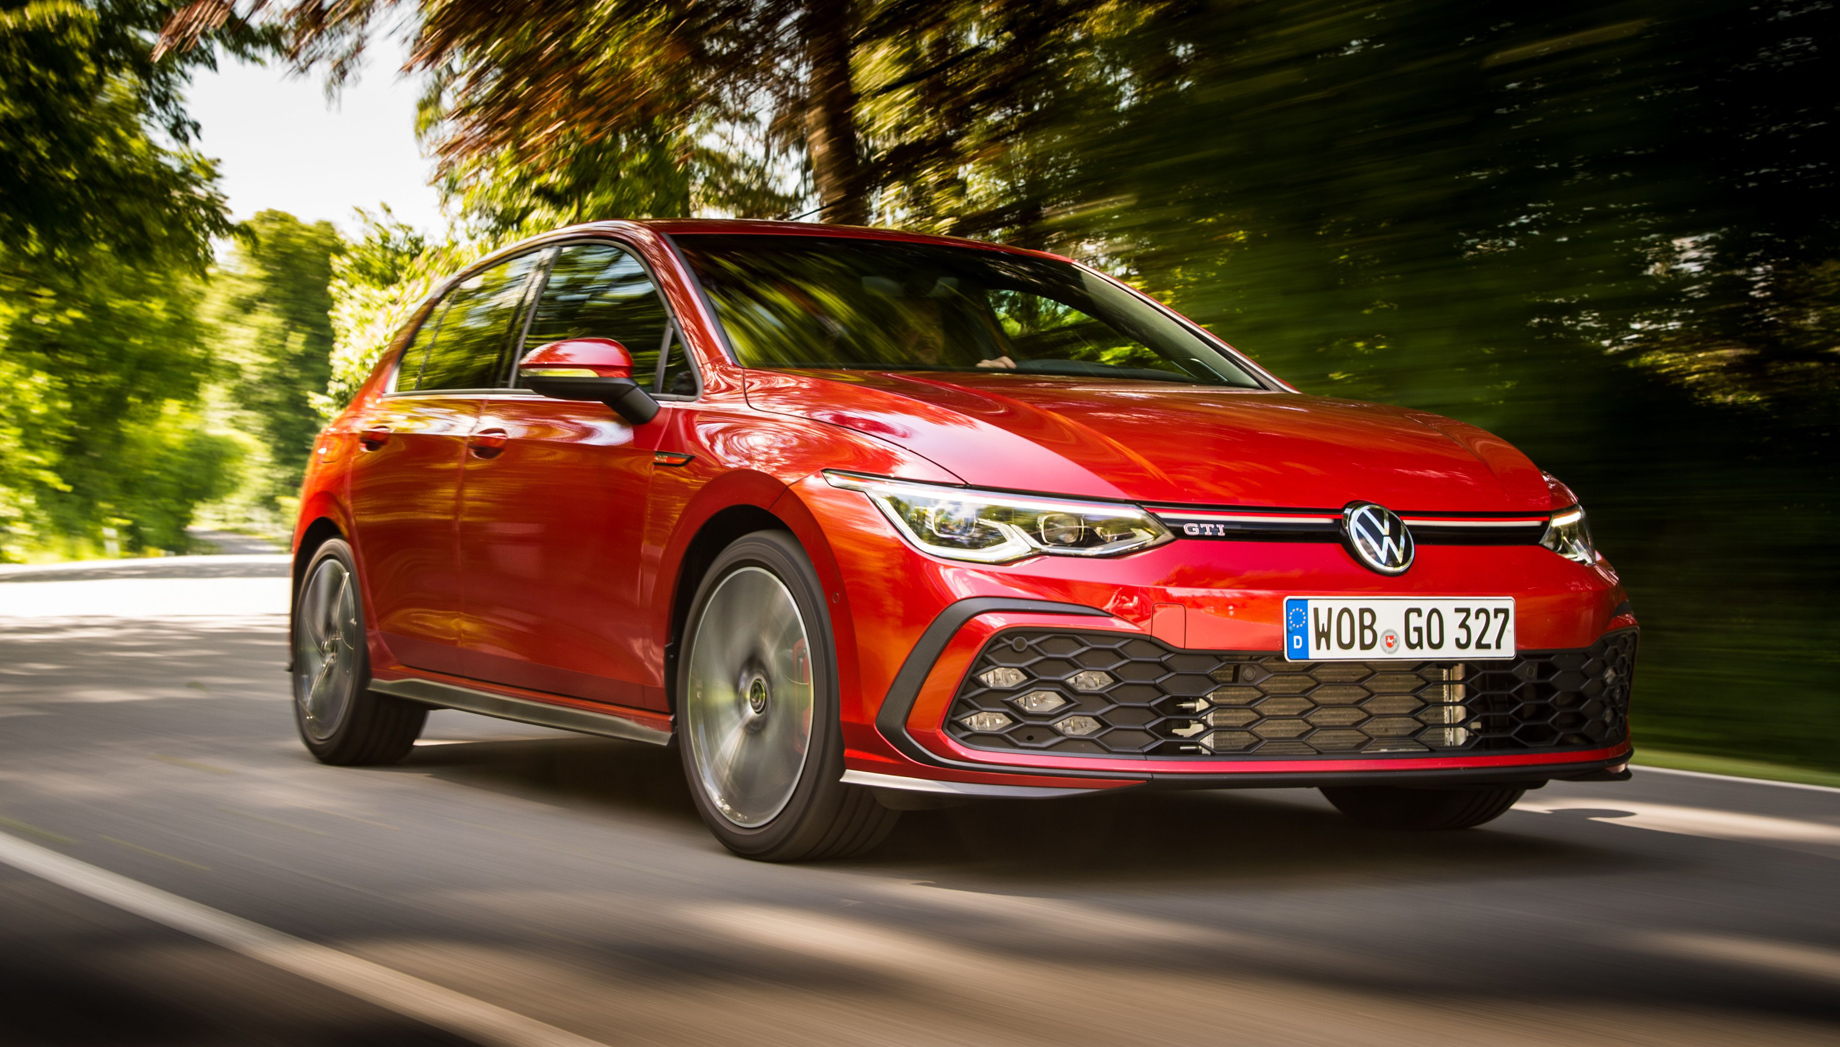 Volkswagen ID.3 стал самым популярным электрокаром вЕвропе